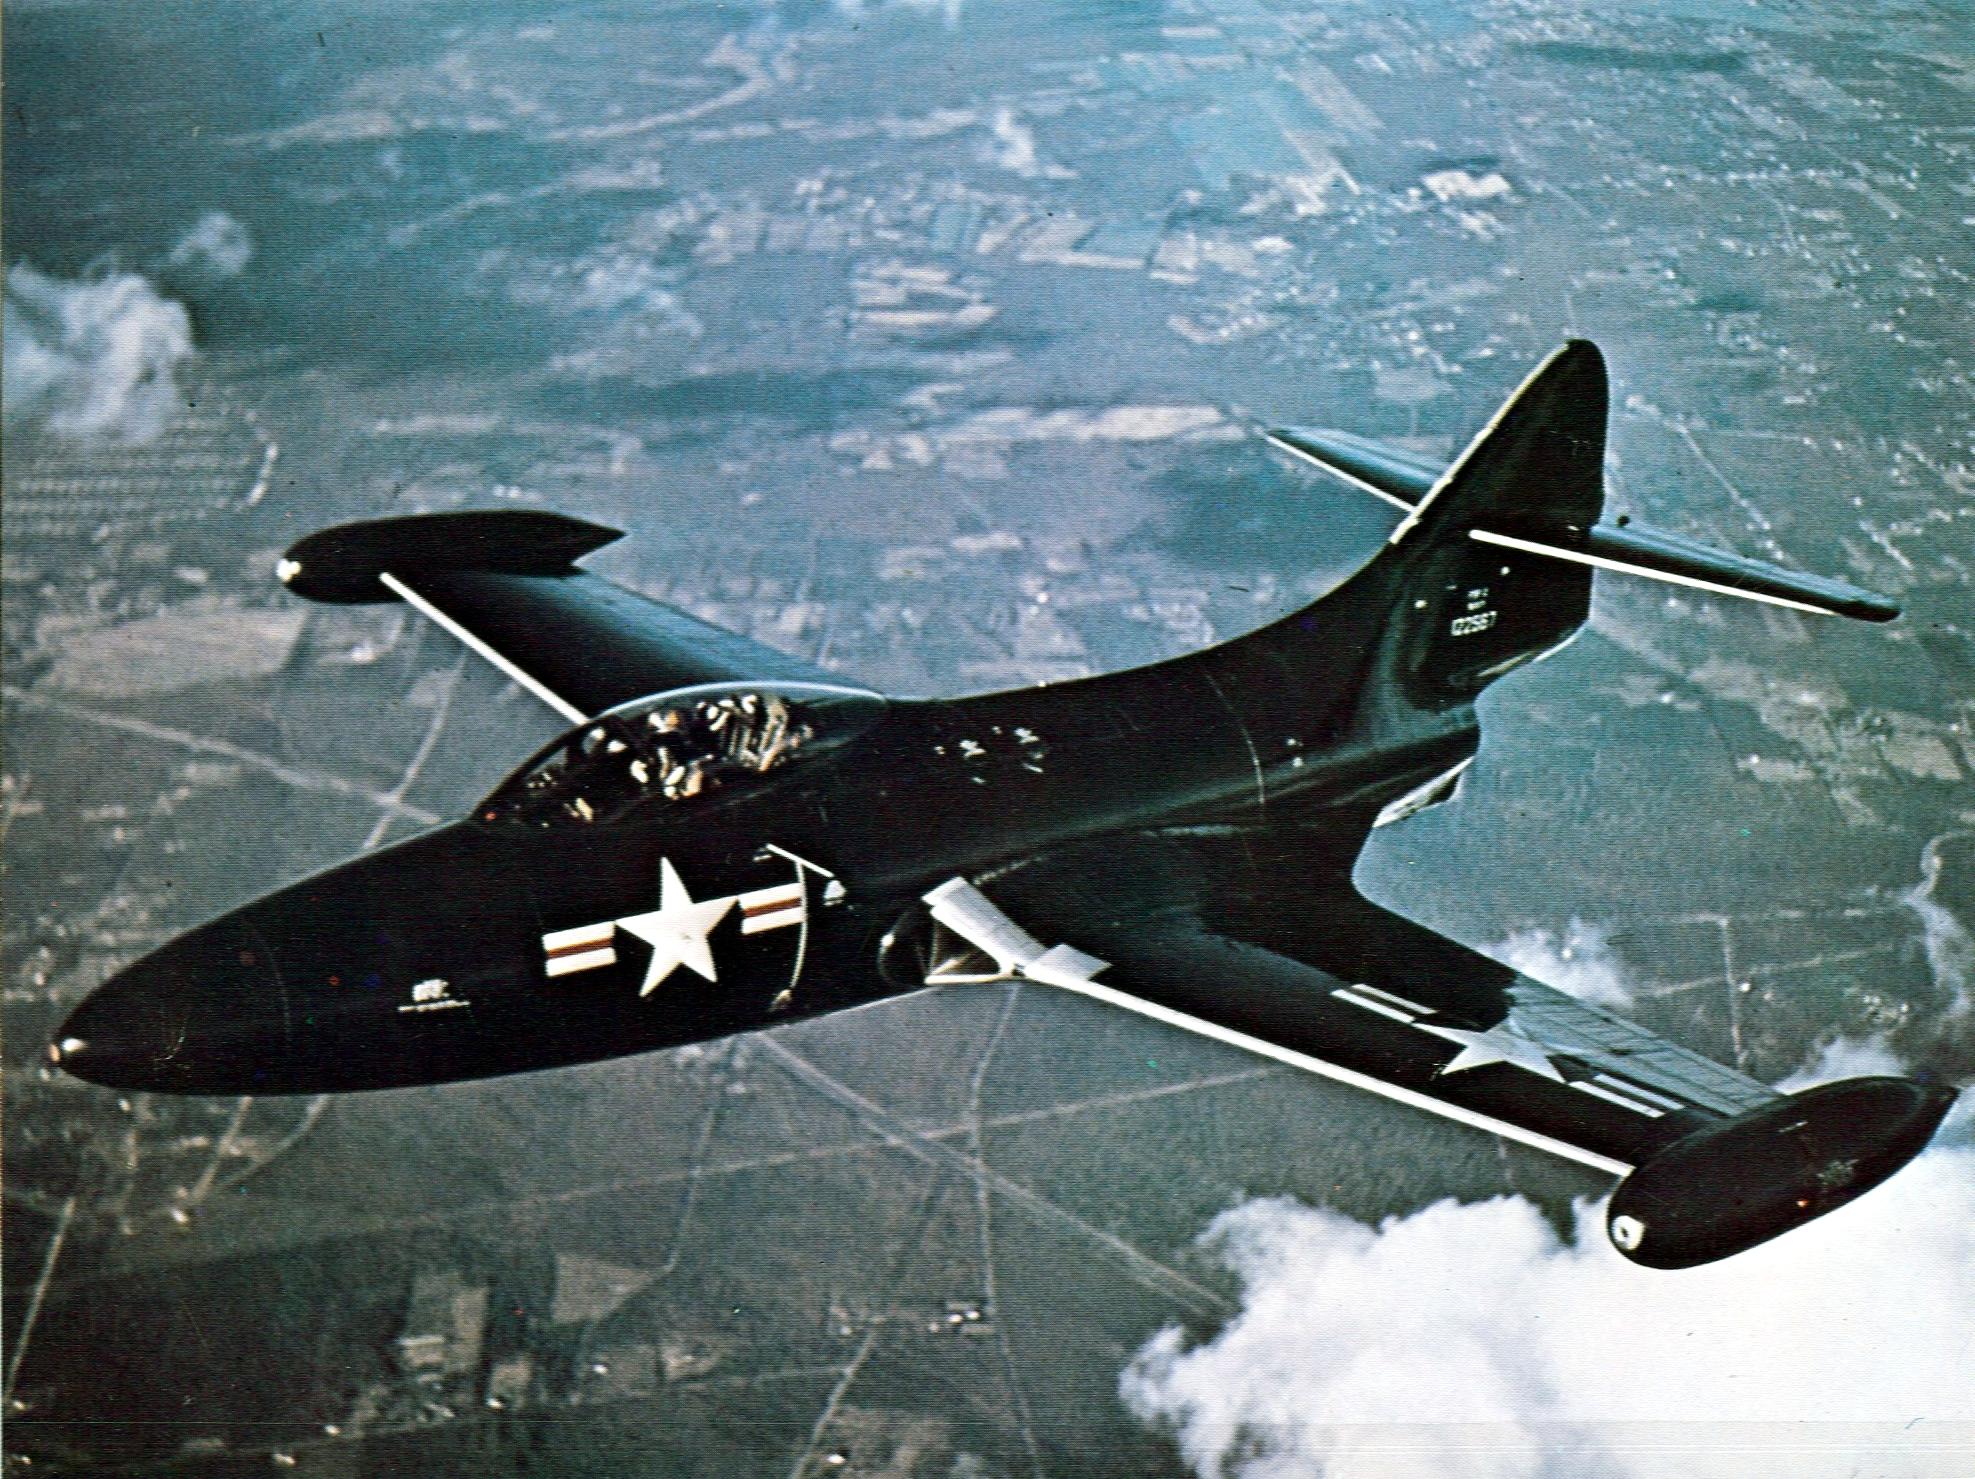 File:Grumman F9F-2 Panther in flight c1949.jpg - Wikimedia Commons